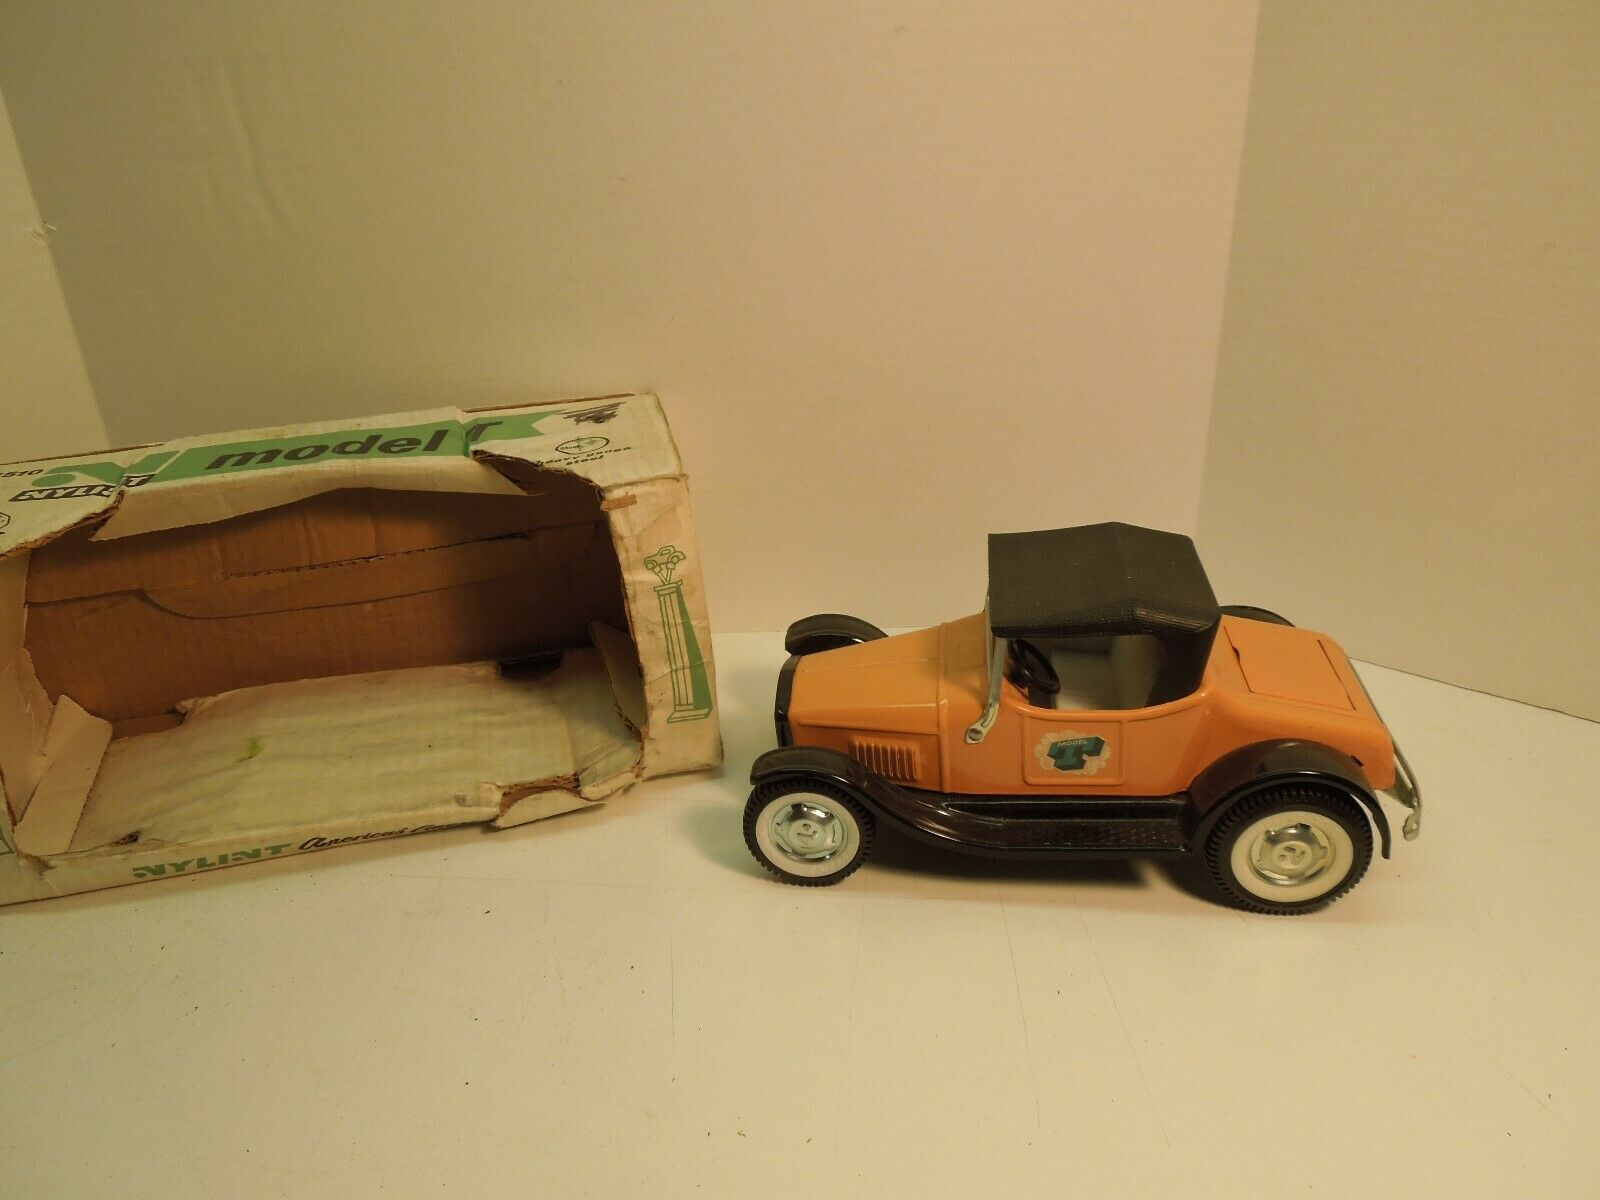 Nylint pressed steel orange Model T toy car